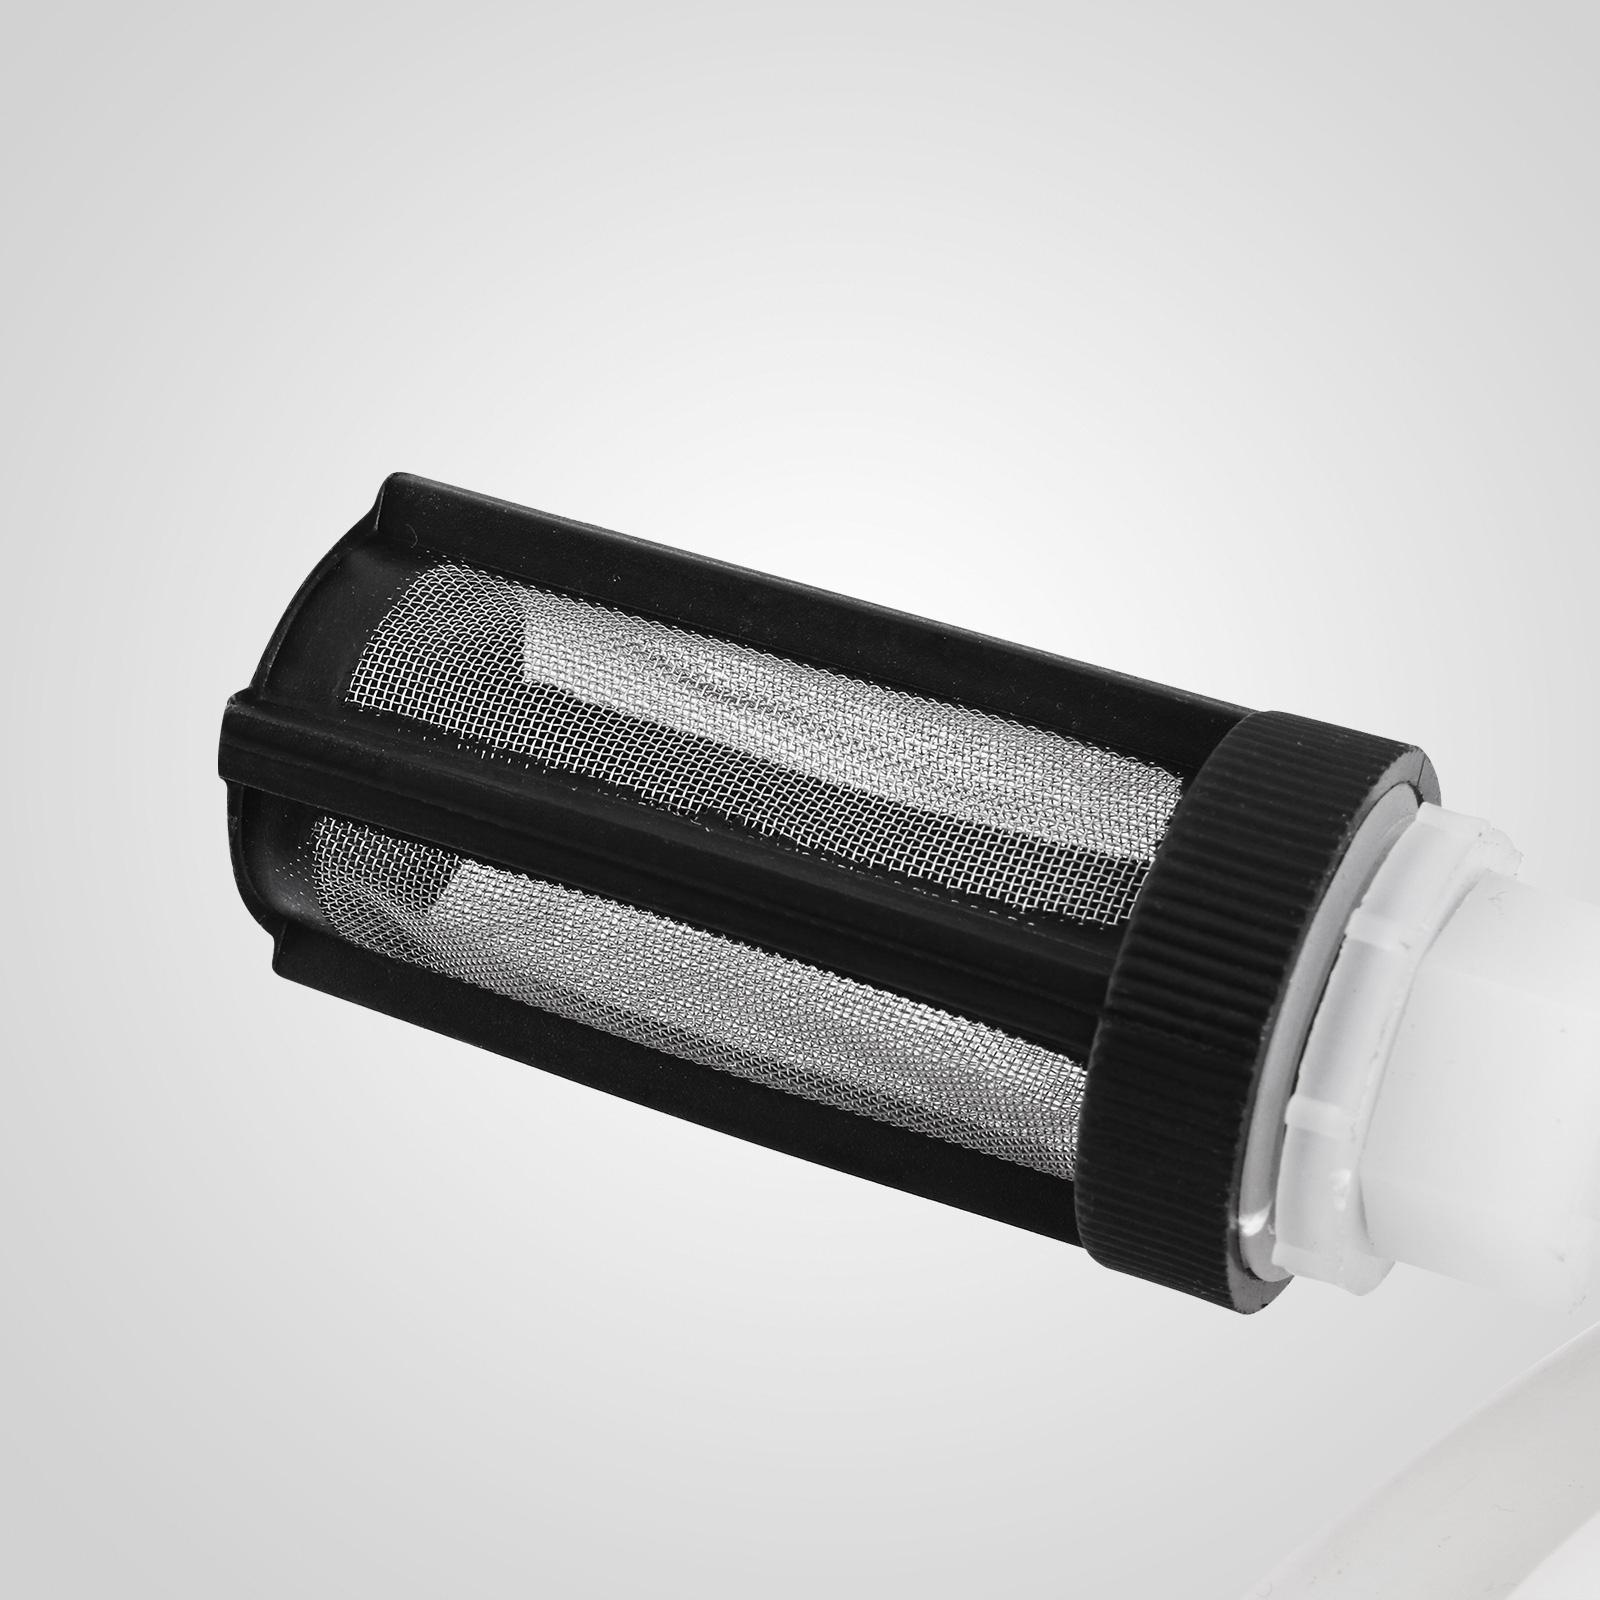 Liquid-Filling-Machine-Filler-Remplissage-2-3500ML-50-500ML-INDUSTRY-SUPPLY miniature 47